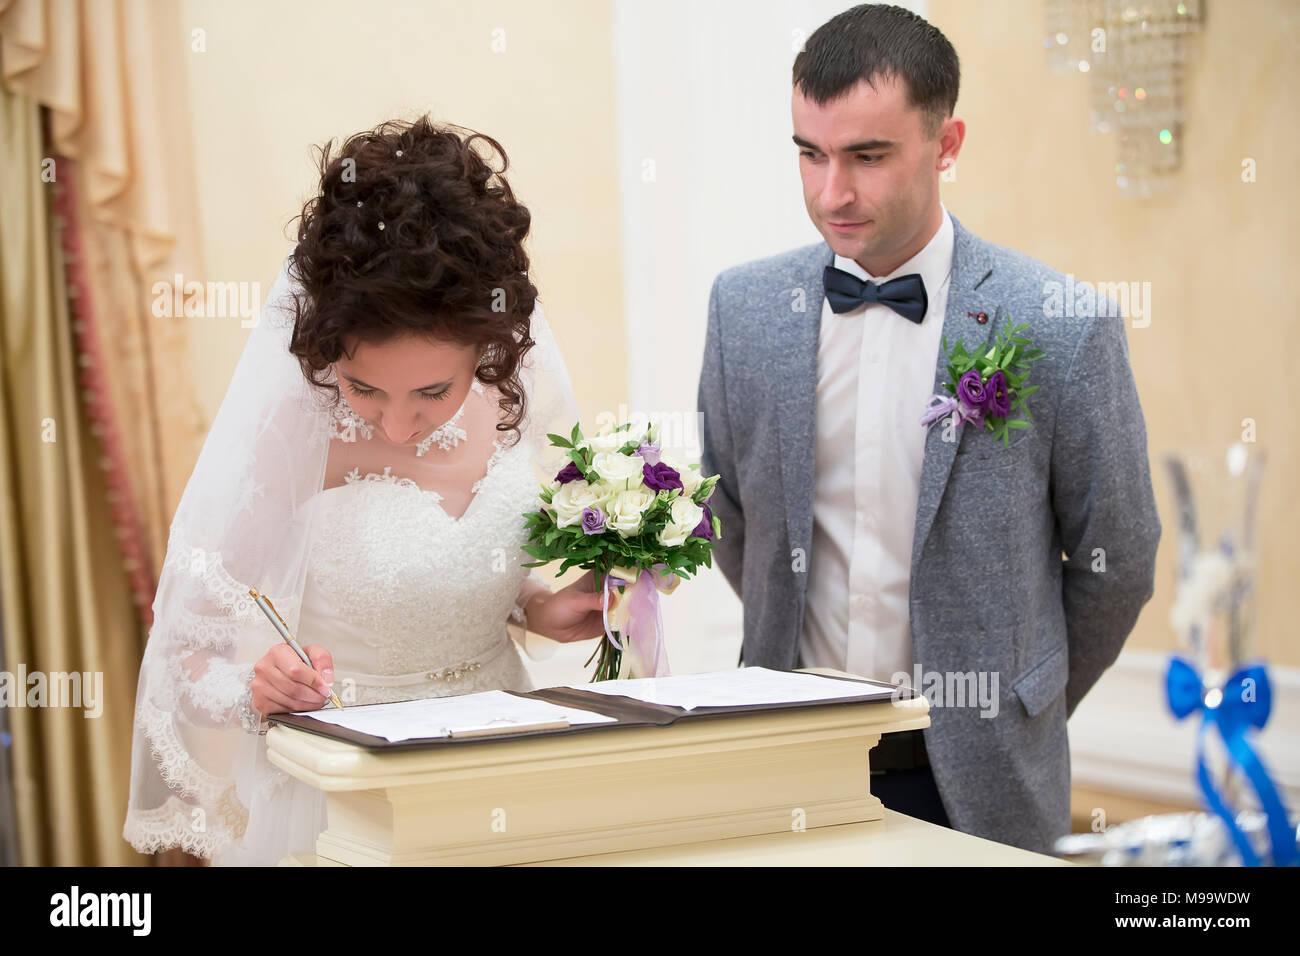 belarus gomel 7 october 2017 wedding day the bride and groom